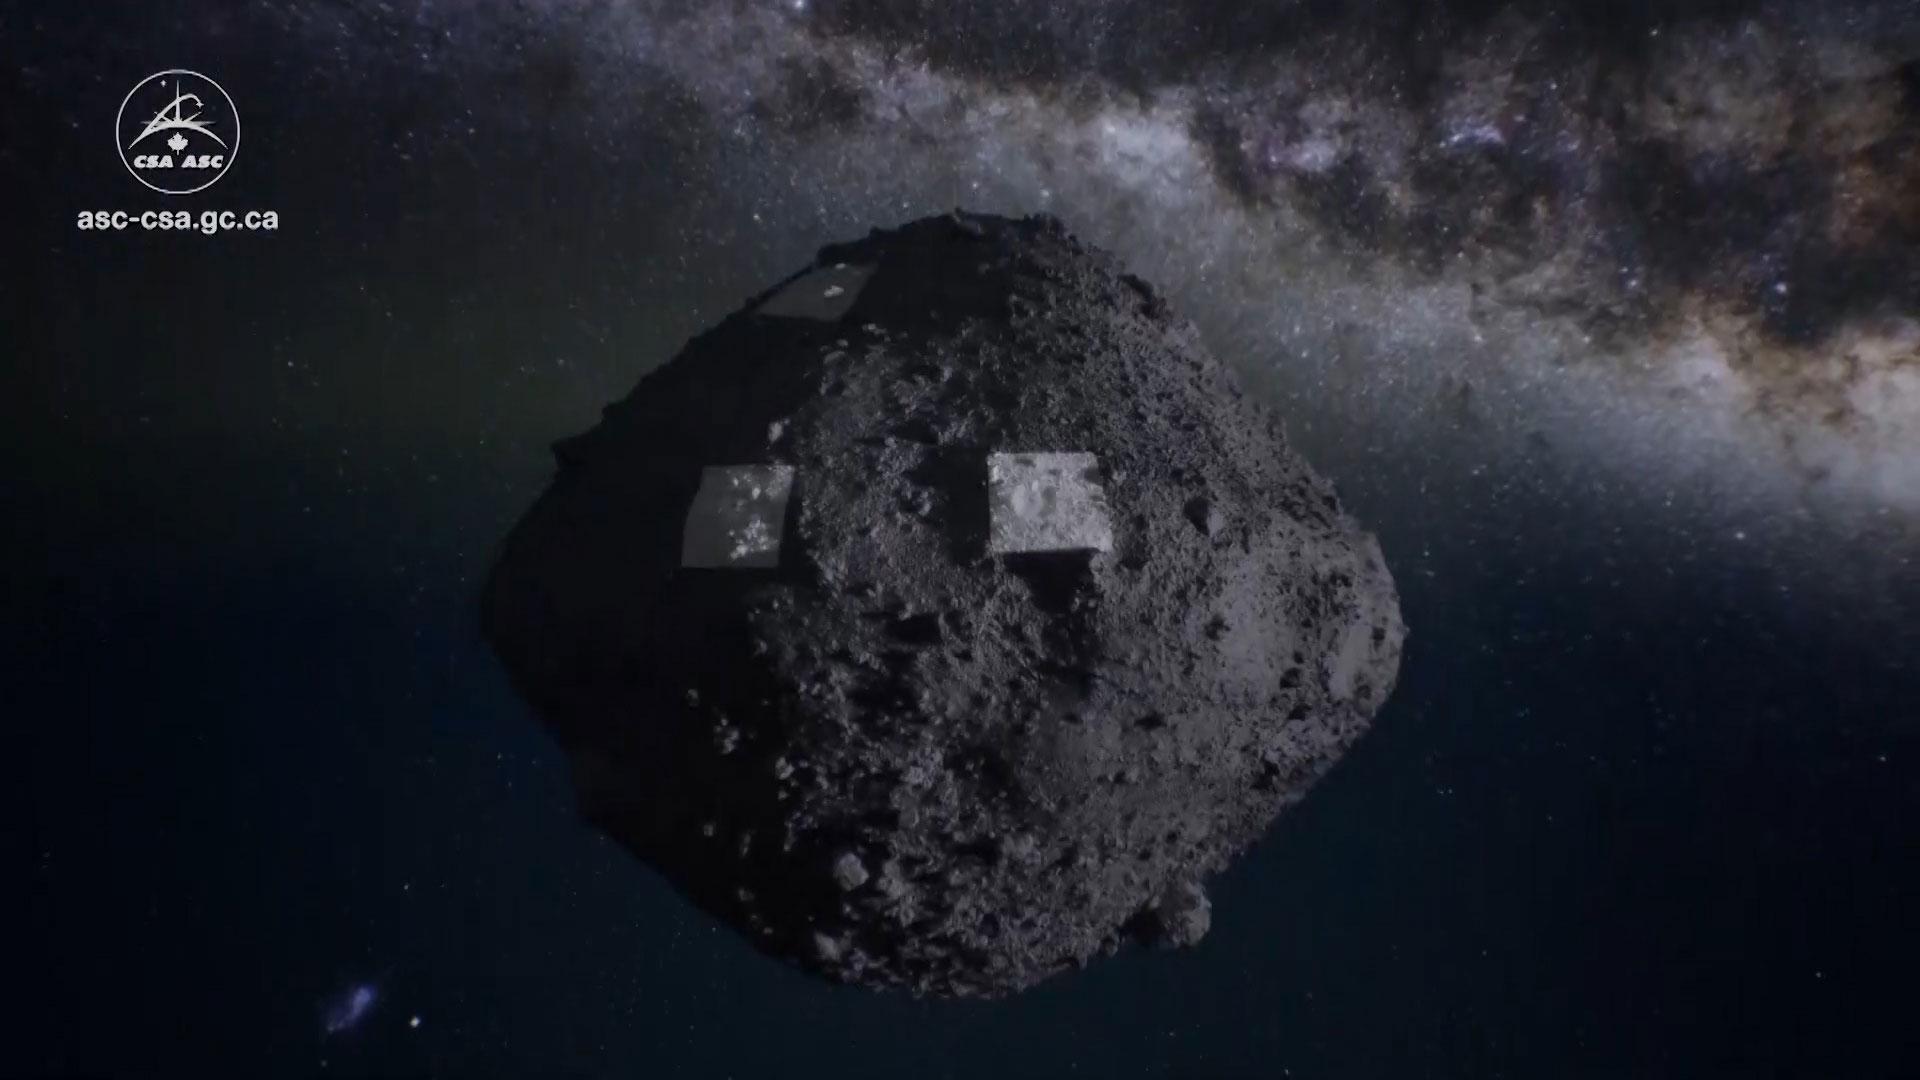 A digital illustration of the asteroid Bennu.